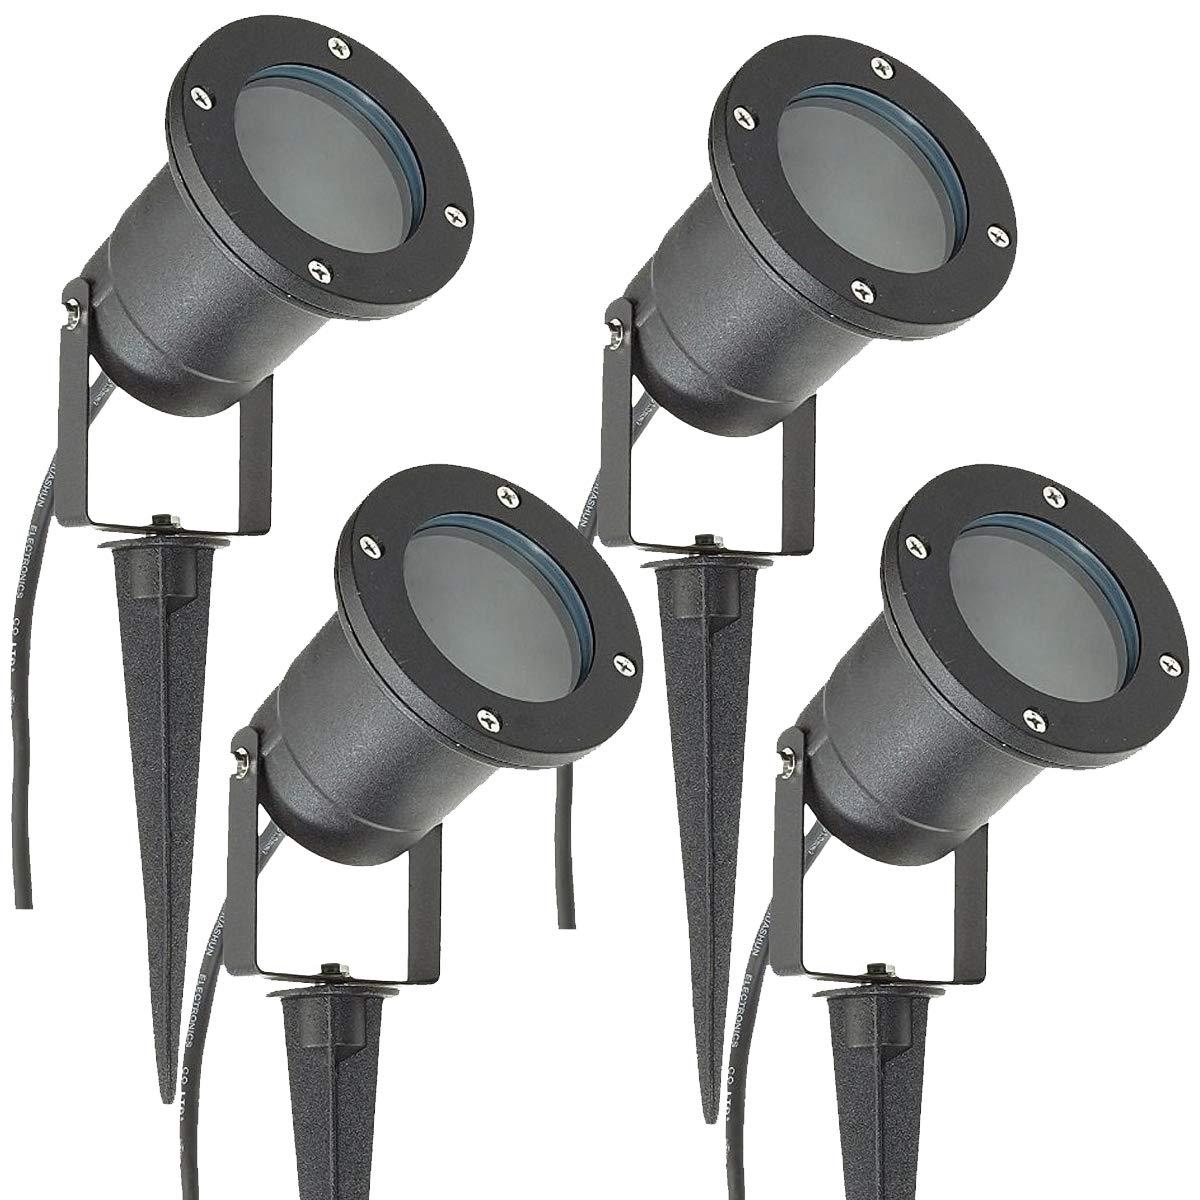 4 x MR16 12V Outdoor Garden Spike Ground Mount or Watt Light IP65 Matt Black Low Voltage Long Life Lamp Company